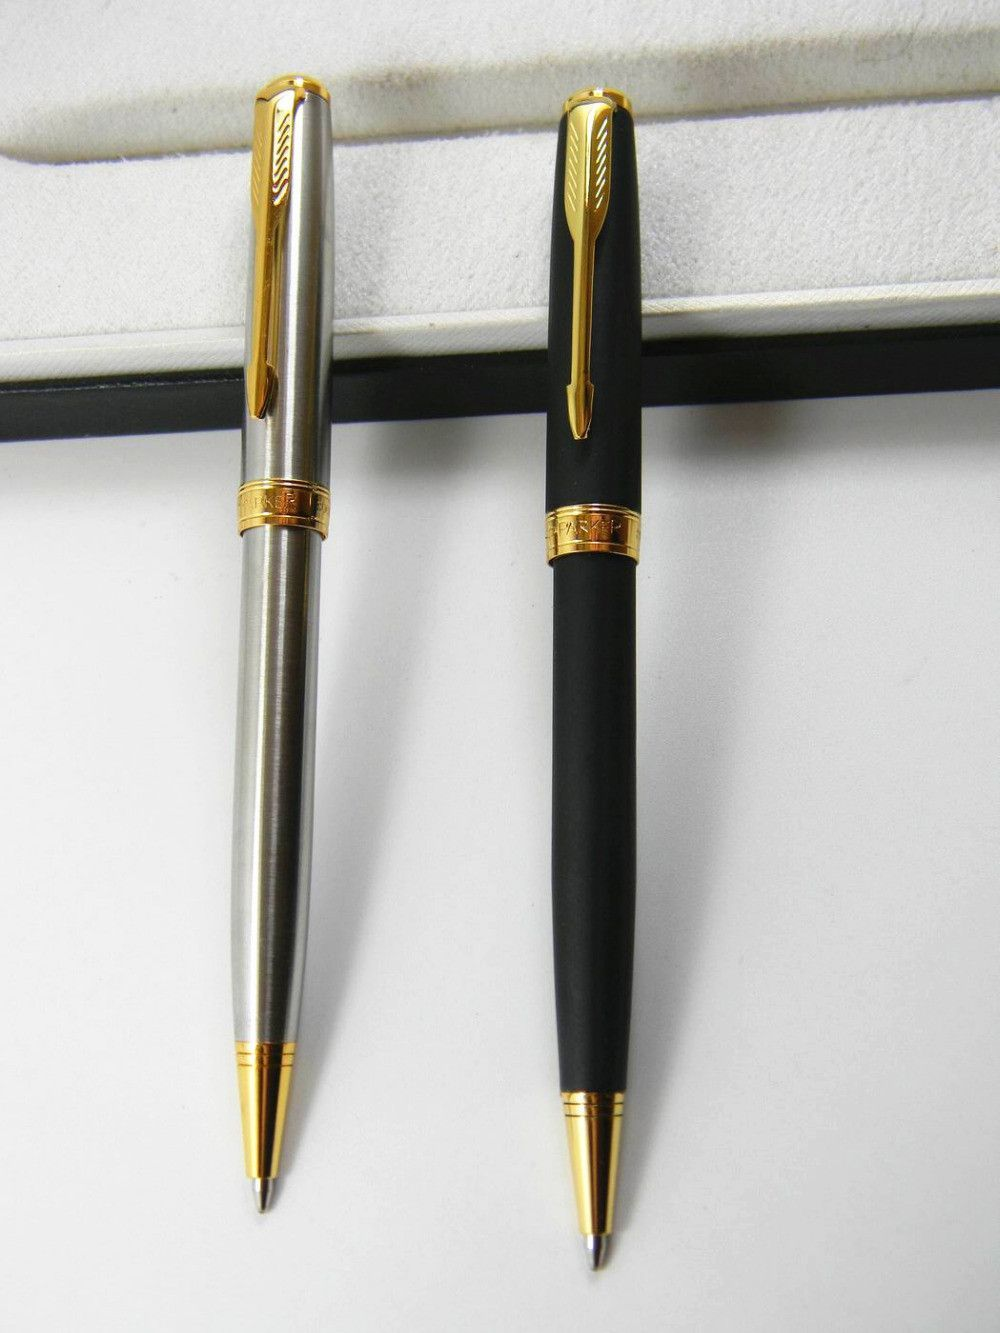 Parker pen with Parker refill Golden arrow pen Ballpoint Pen